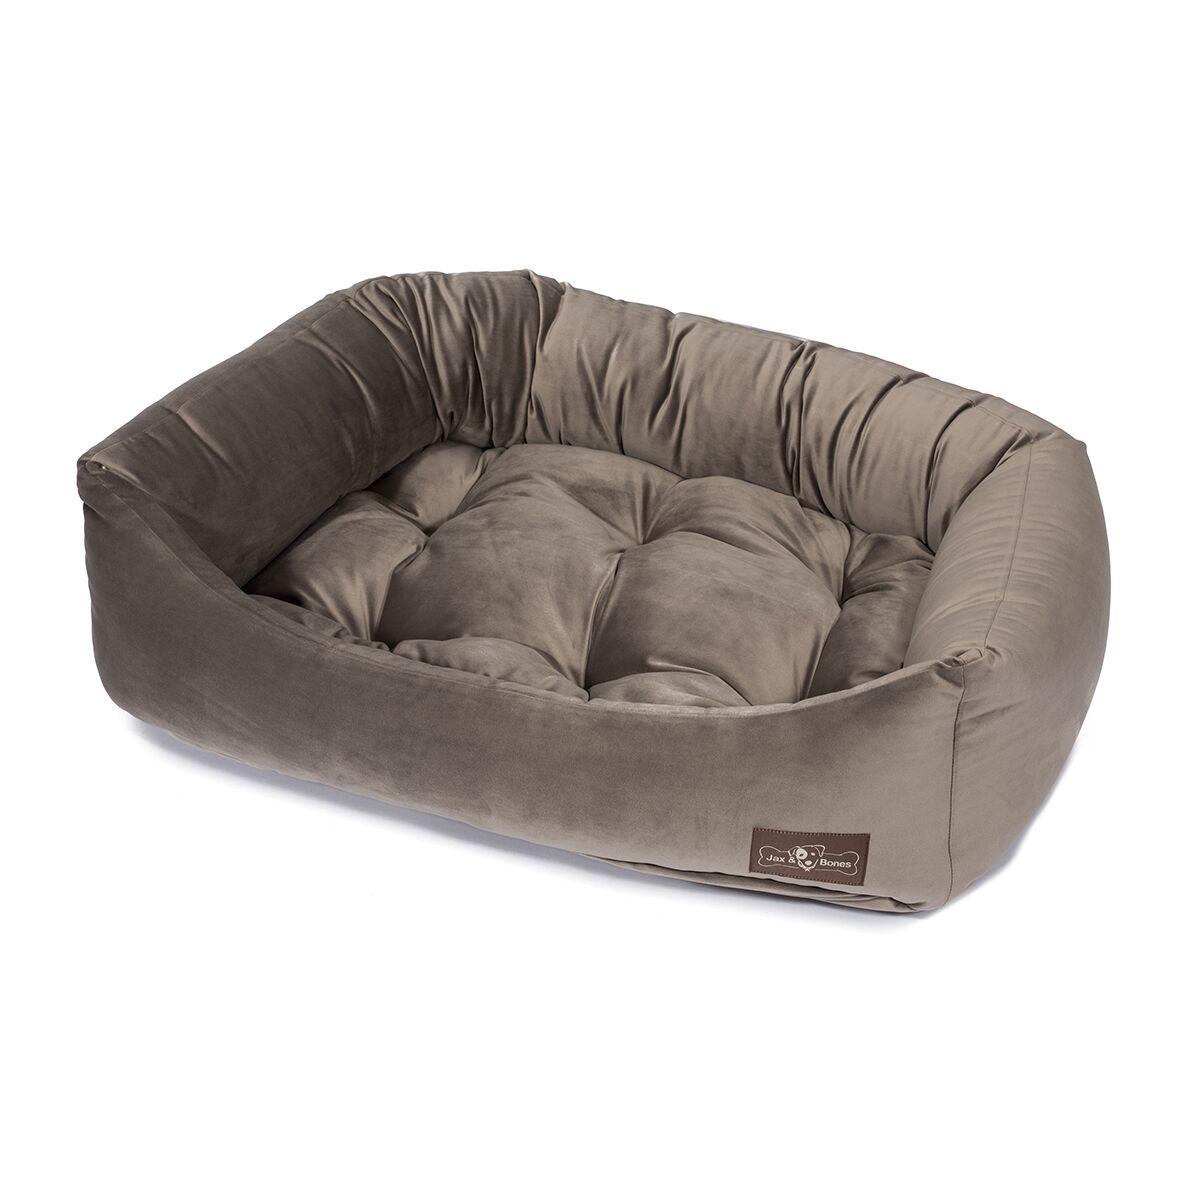 Plush Velour Napper Bed Size: Extra Large (42